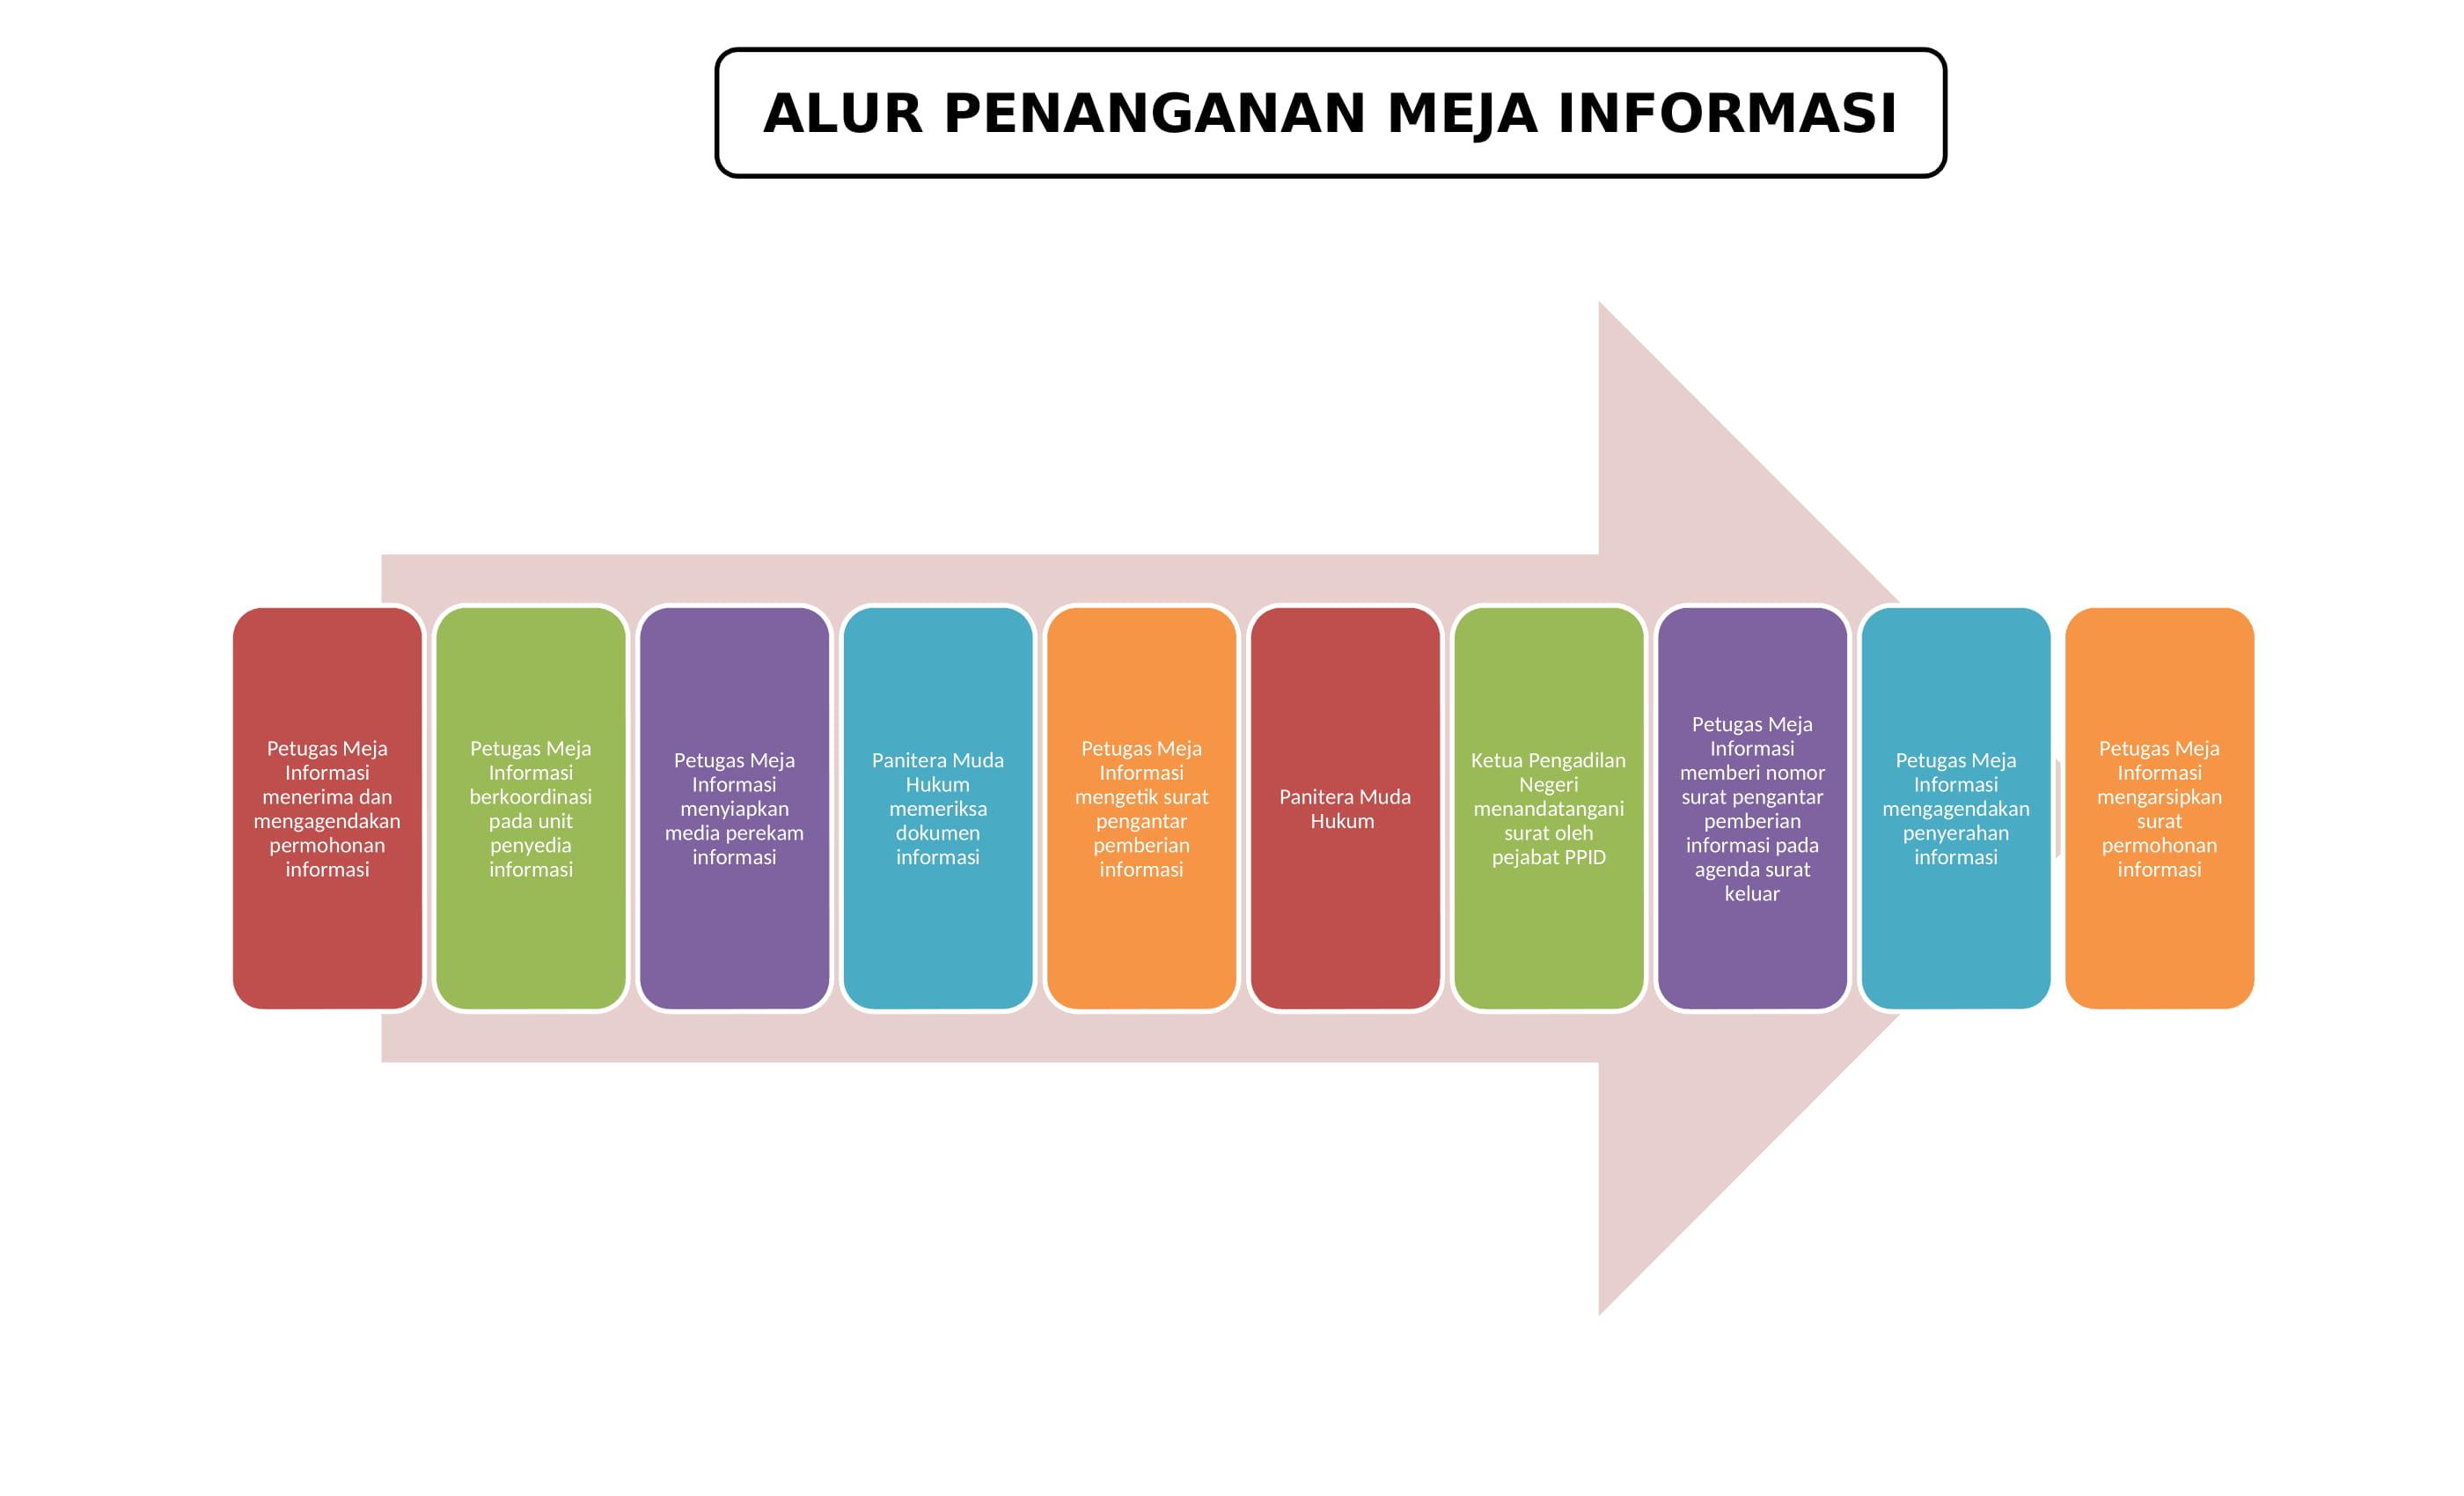 Permohonan_informasi-1.jpg